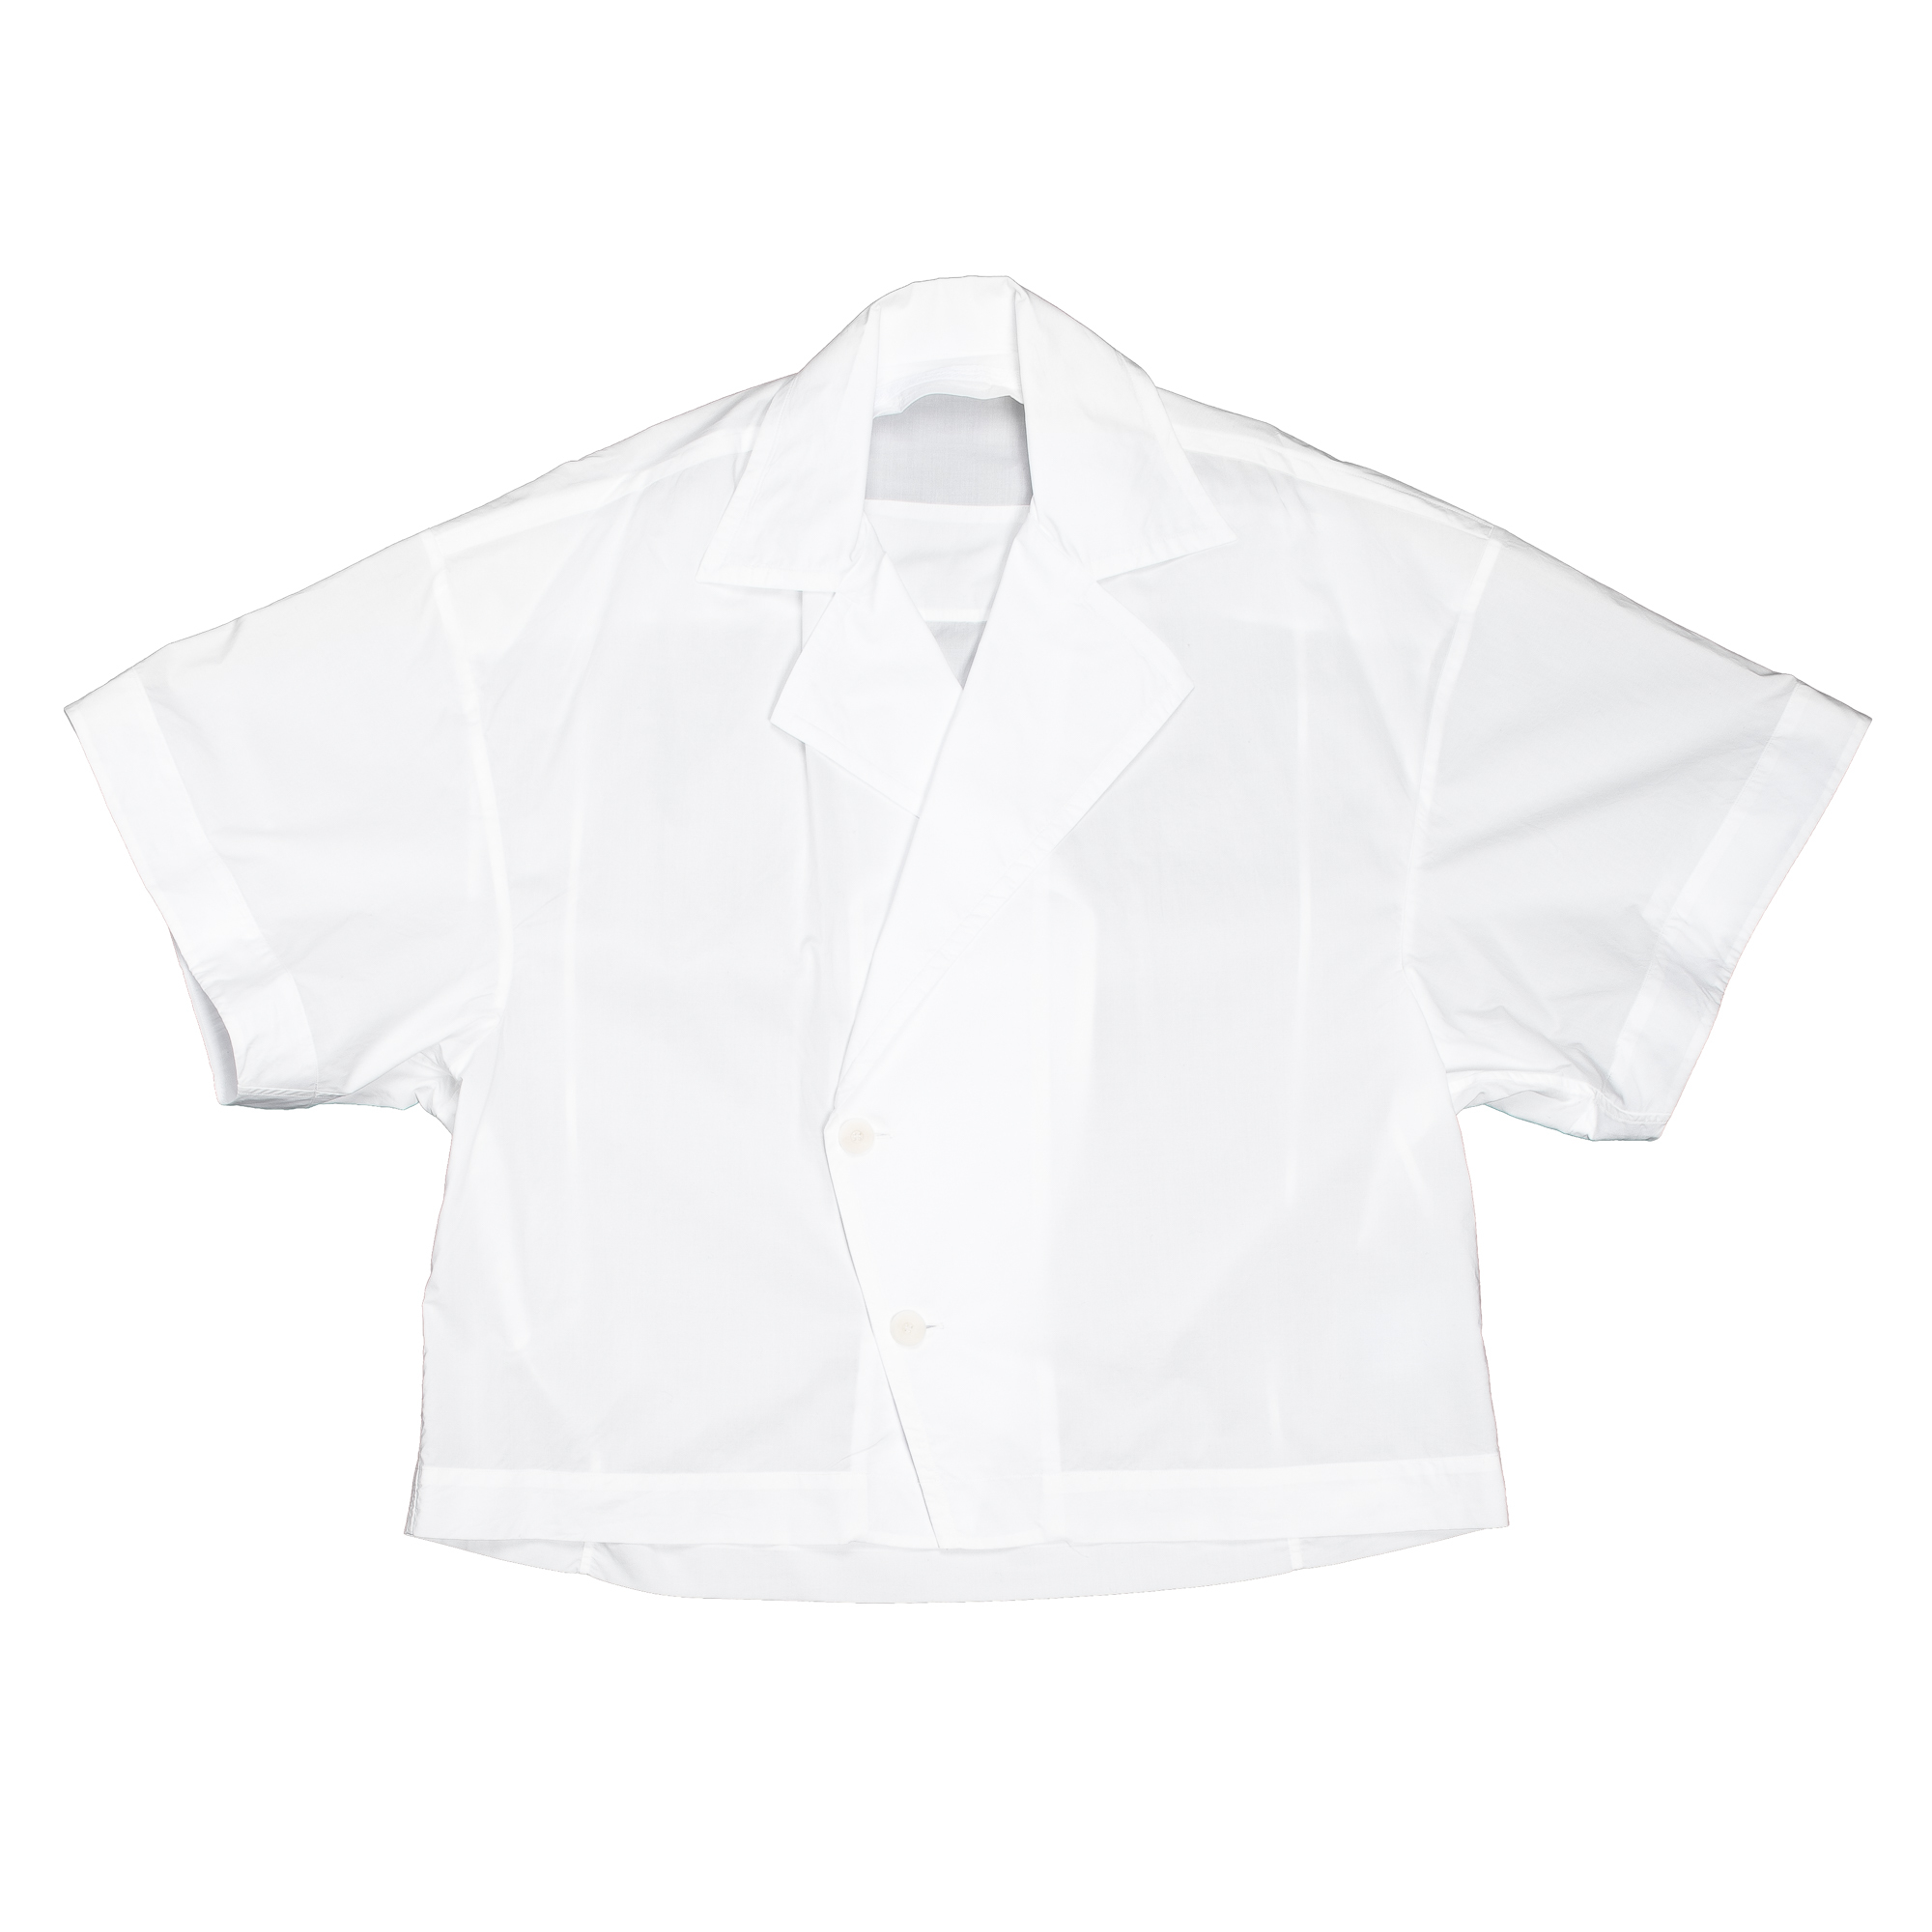 657SHM3-WHITE / オープンカラーボックスシャツ